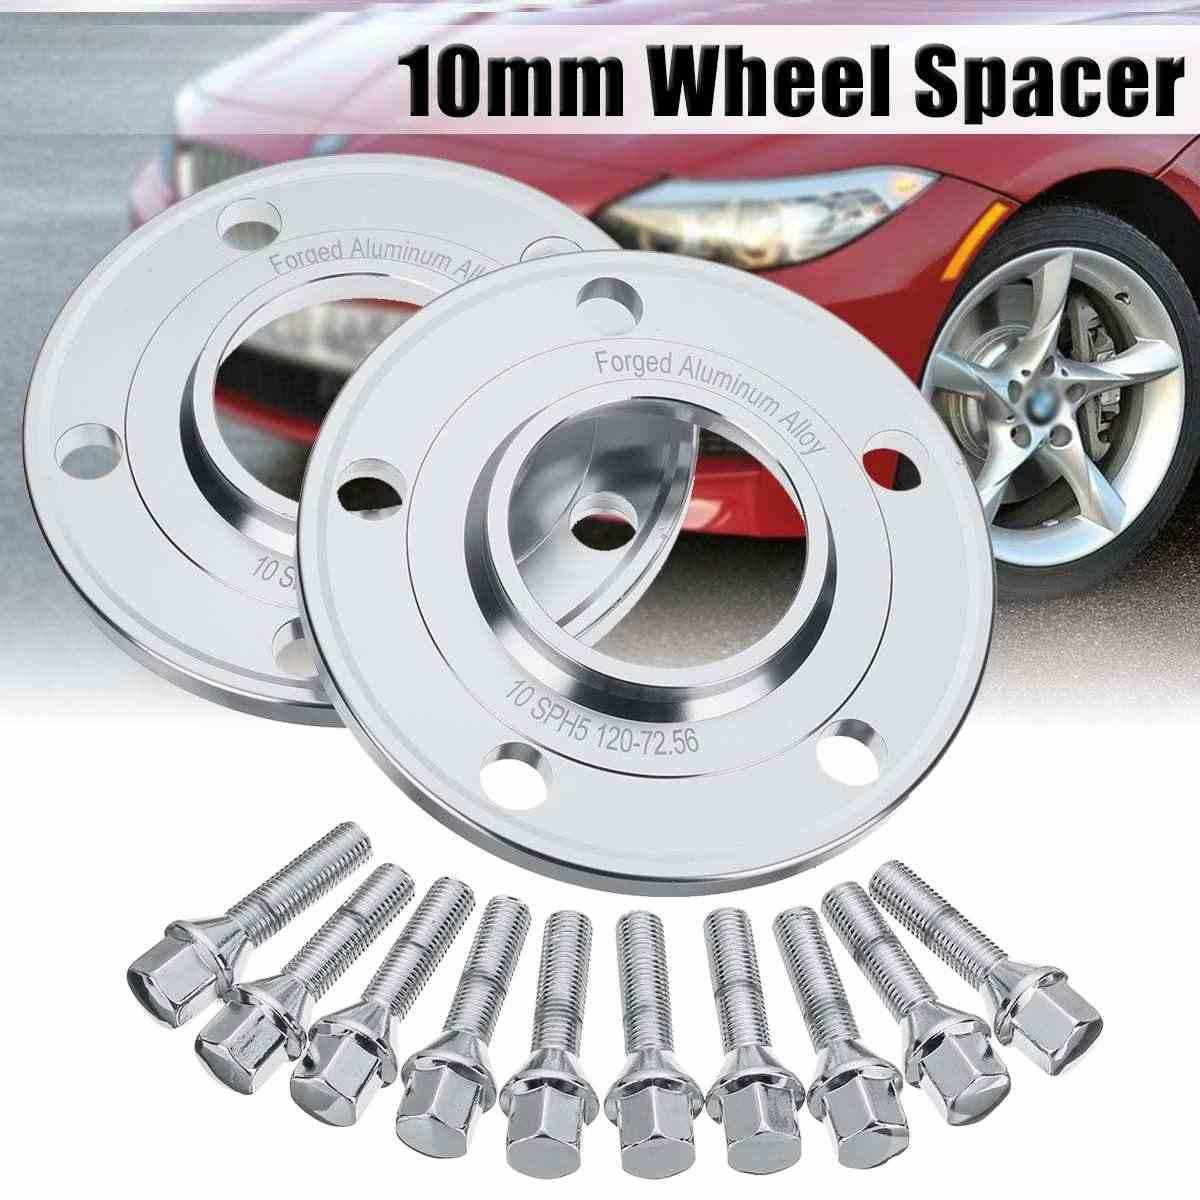 Pair Car 10mm Wheel Spacer Adapter 5x120mm Tire Spacers For Bmw 1 3 5 7 8 Series Z3 Z4 Z8 E88 E30 E36 E46 E28 E34 Tire Accessories Aliexpress